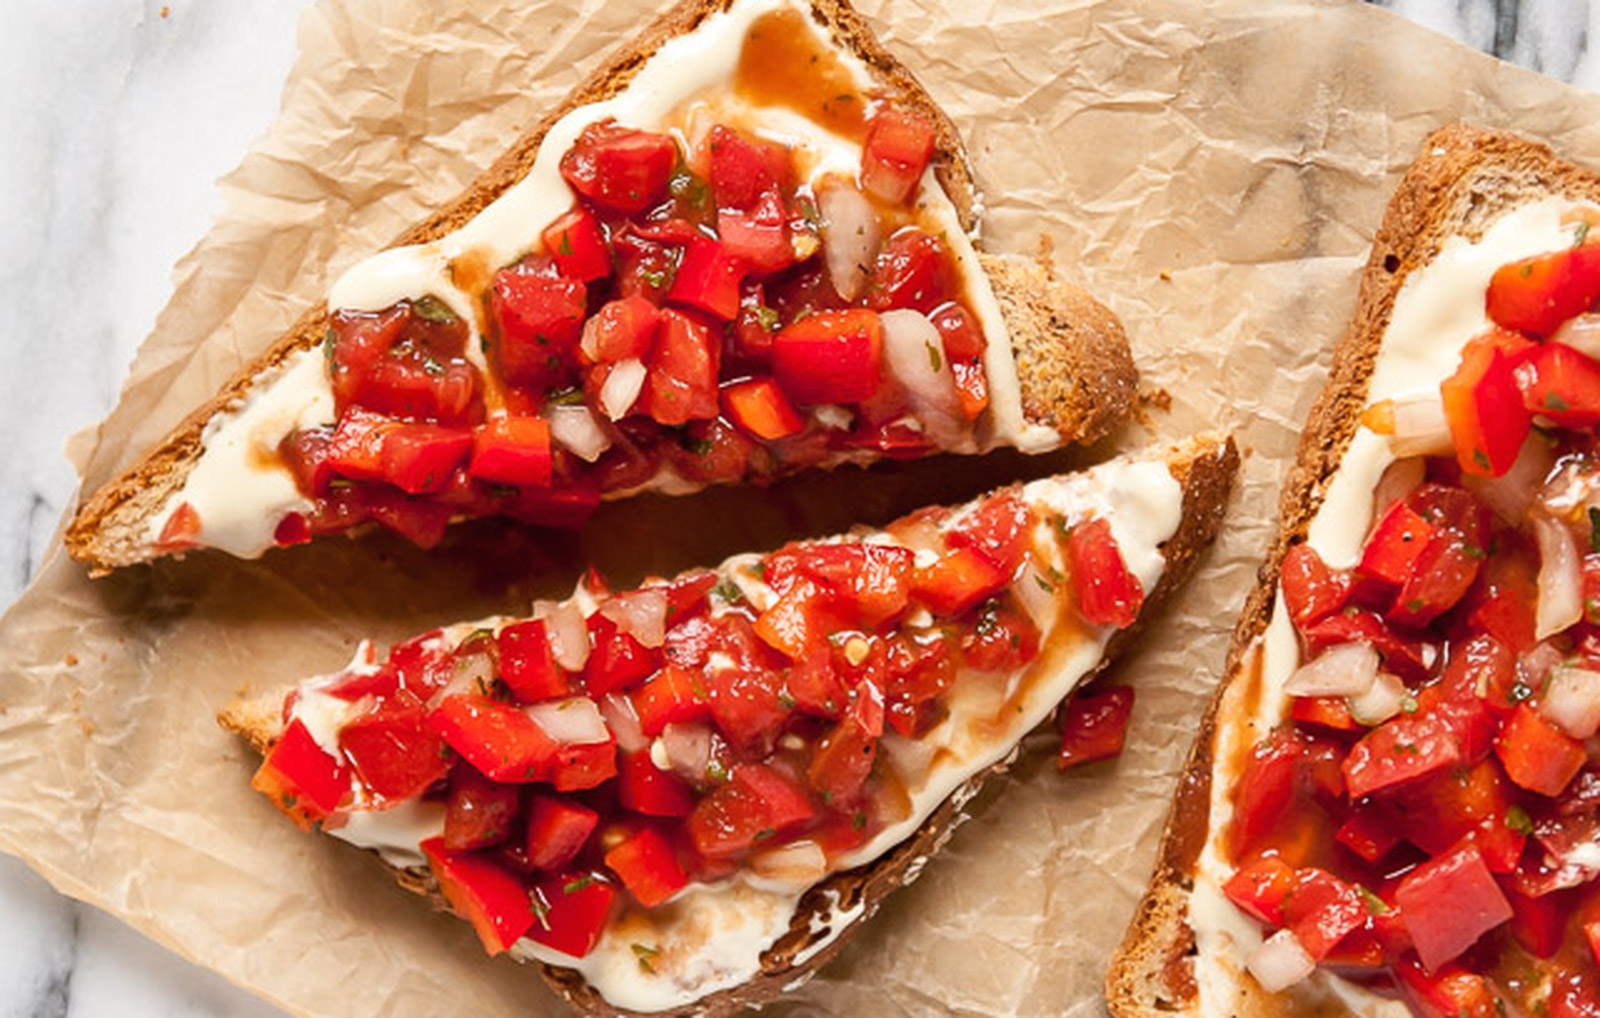 Simple Red Pepper Bruschetta With Homemade Roasted Garlic Ricotta [Vegan]